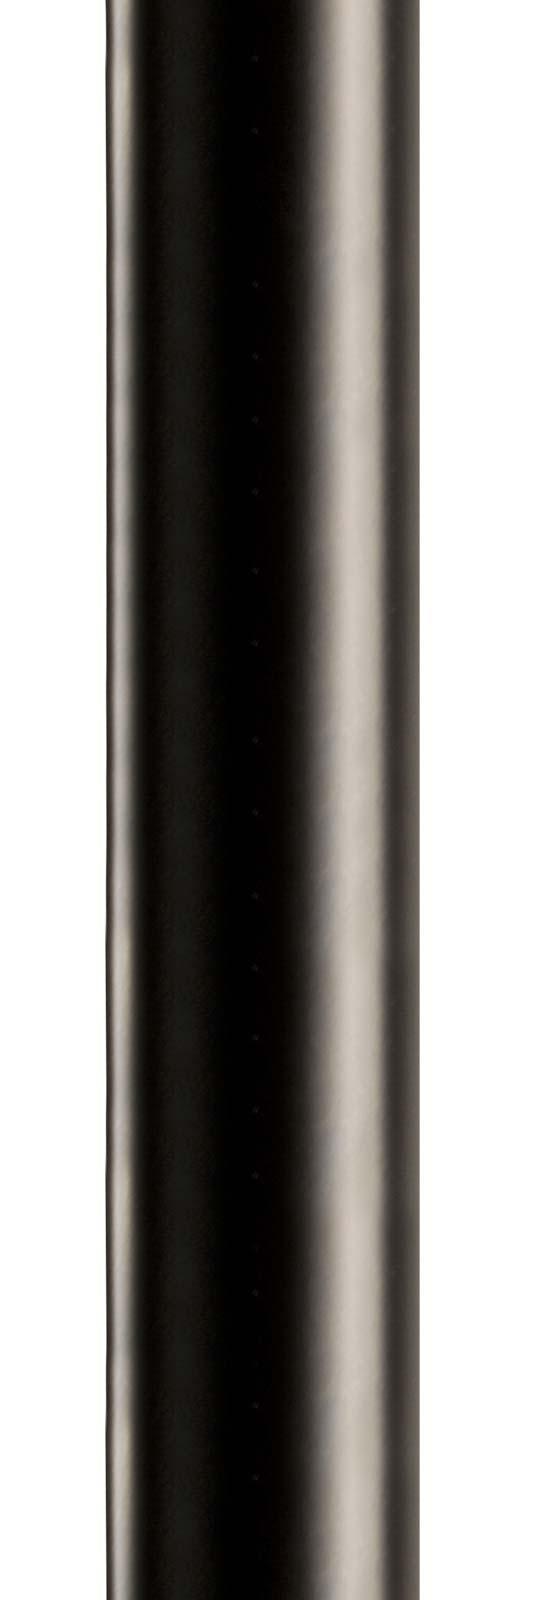 Ultimate Support Js Ts50 2 Jamstands Tripod Speaker